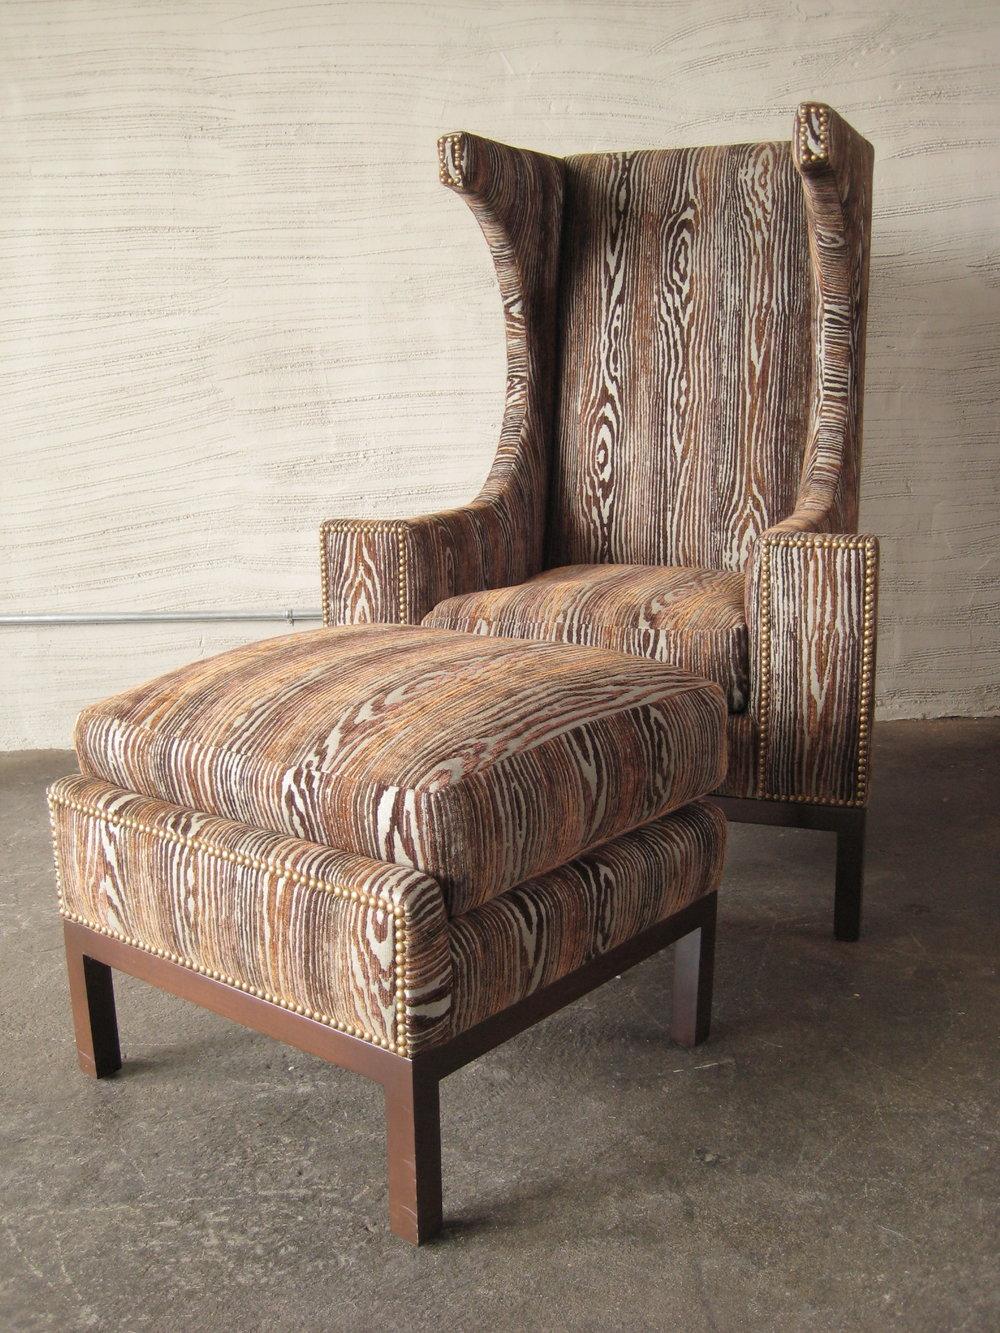 Explore Furniture - BY RJ THORNBURG